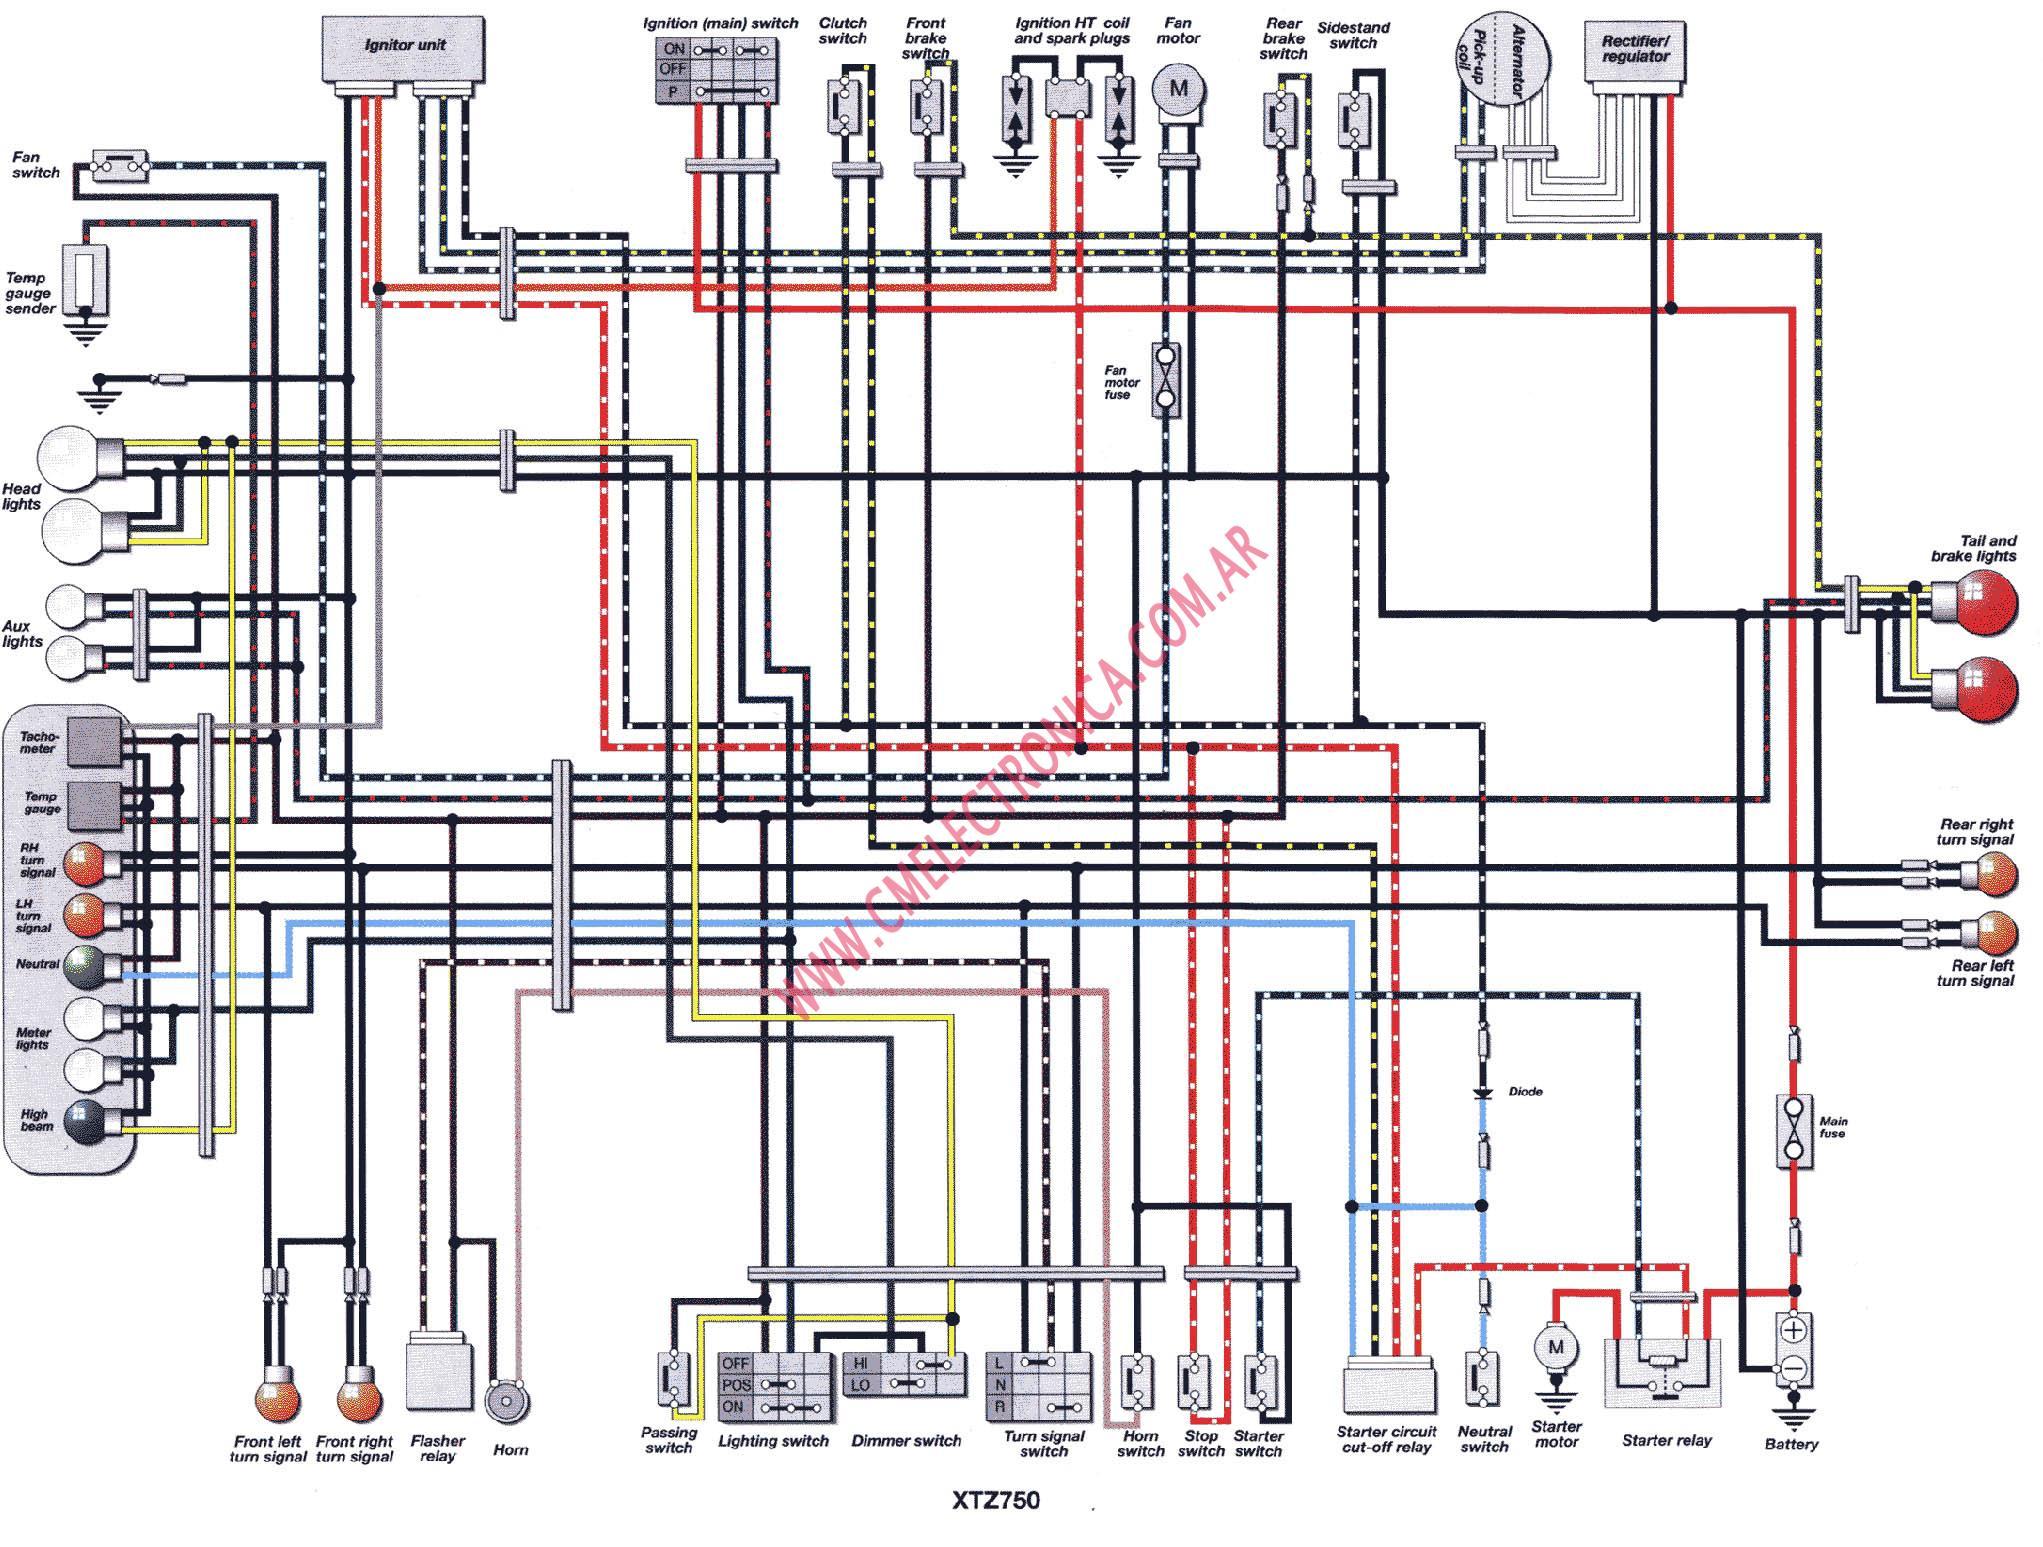 1982 Yamaha 650 Maxim Wiring Diagram Detailed Schematic Diagrams 1983 Virago 500 Auto Electrical